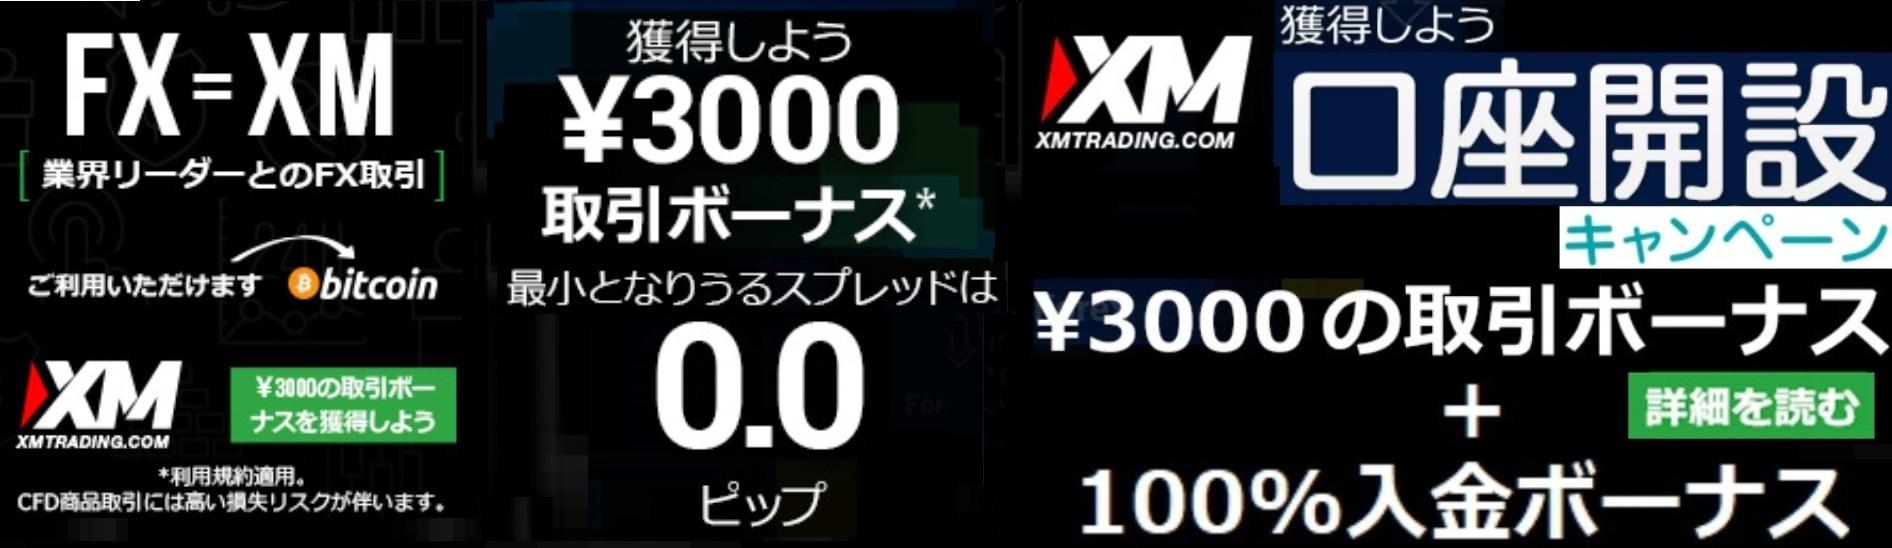 XM評判まとめ.jpg